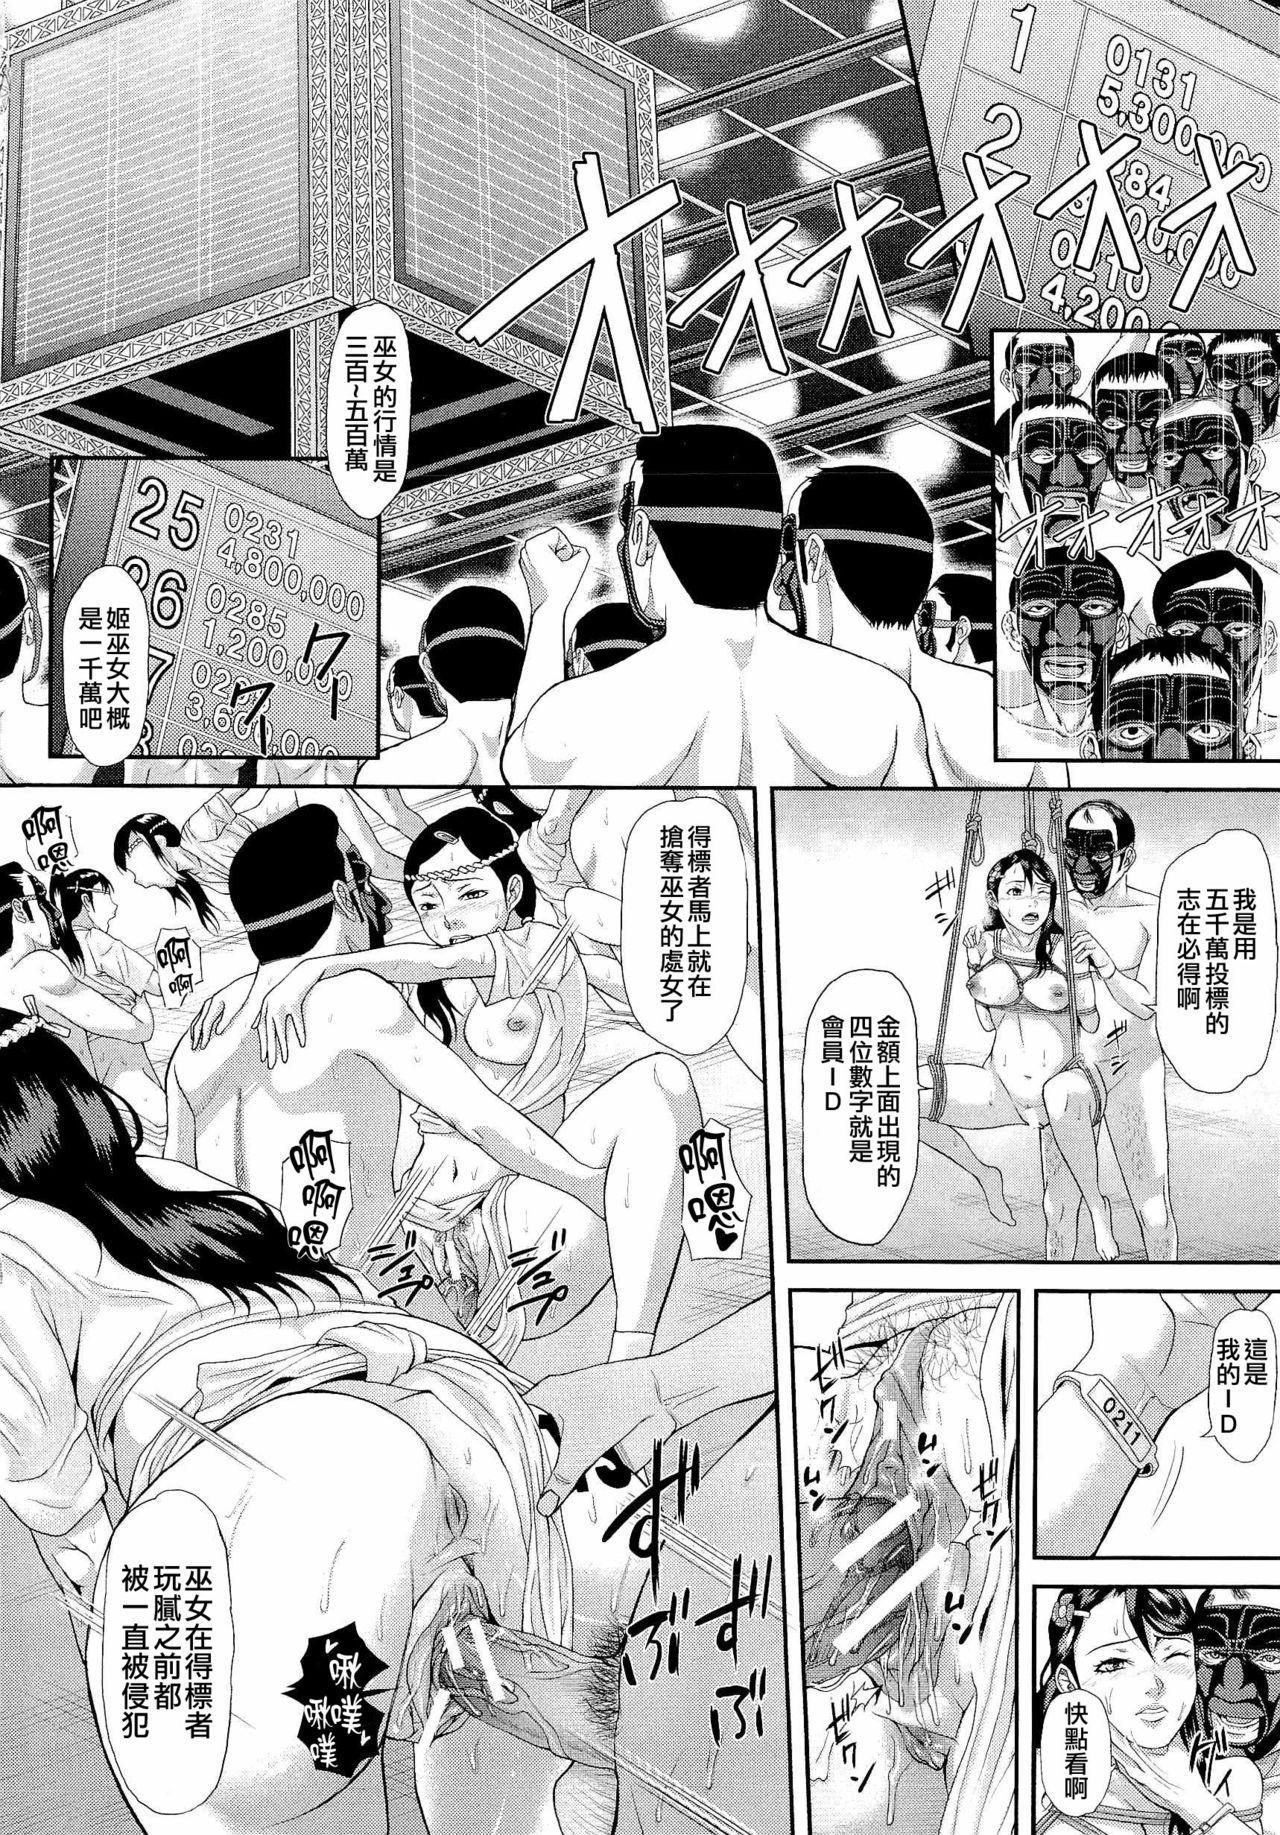 [Honebuto Danshaku] Innou Kaizou Program ~Oyako Zecchou Cult Ochi~ [Chinese]【不想记名重嵌--高质量图源】 190